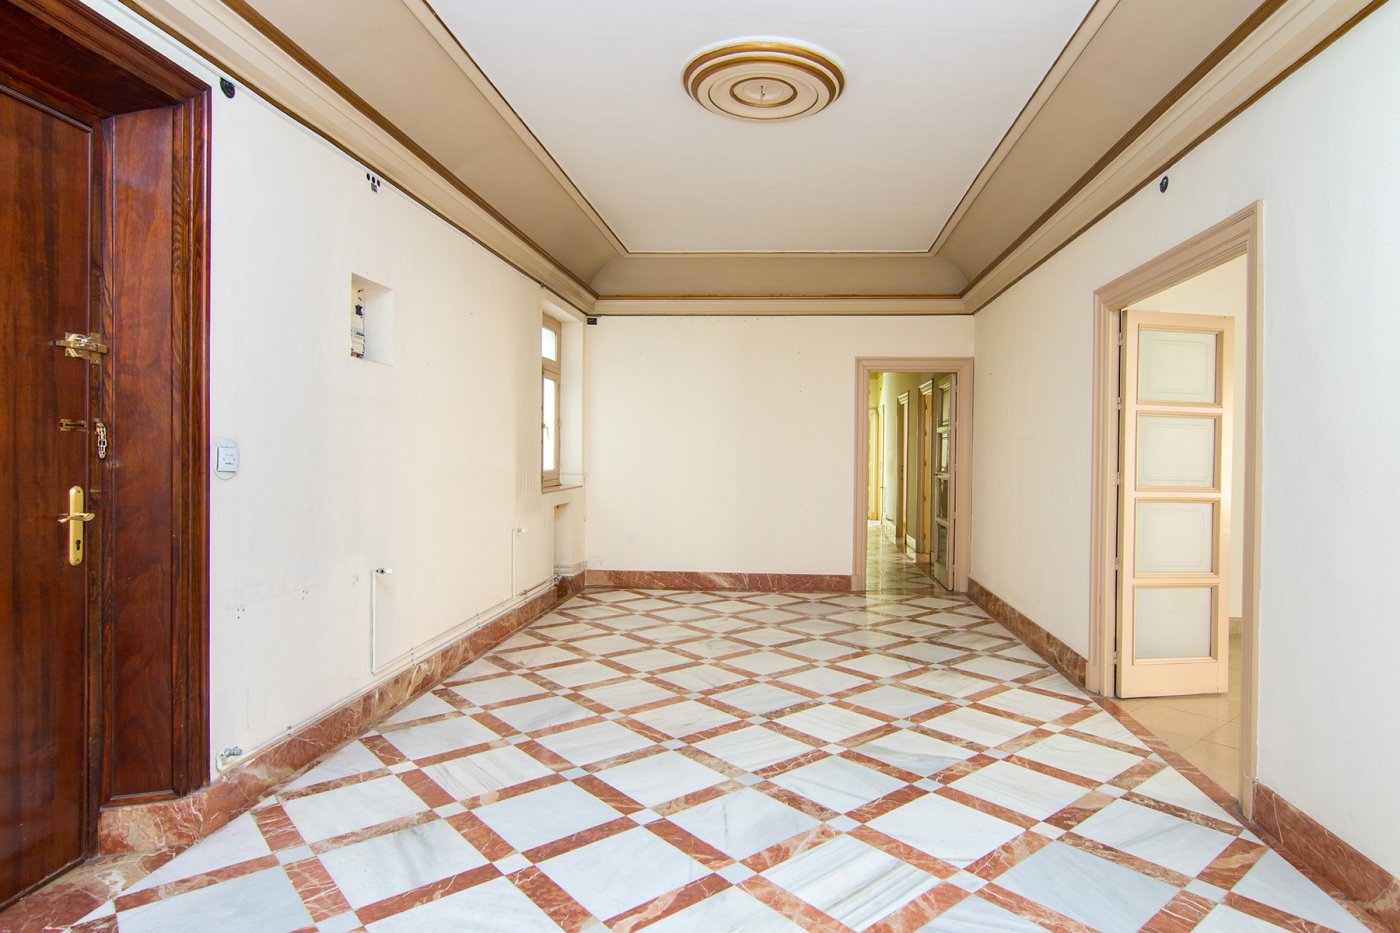 Espectacular piso en la calle GANIVET!!!, Granada